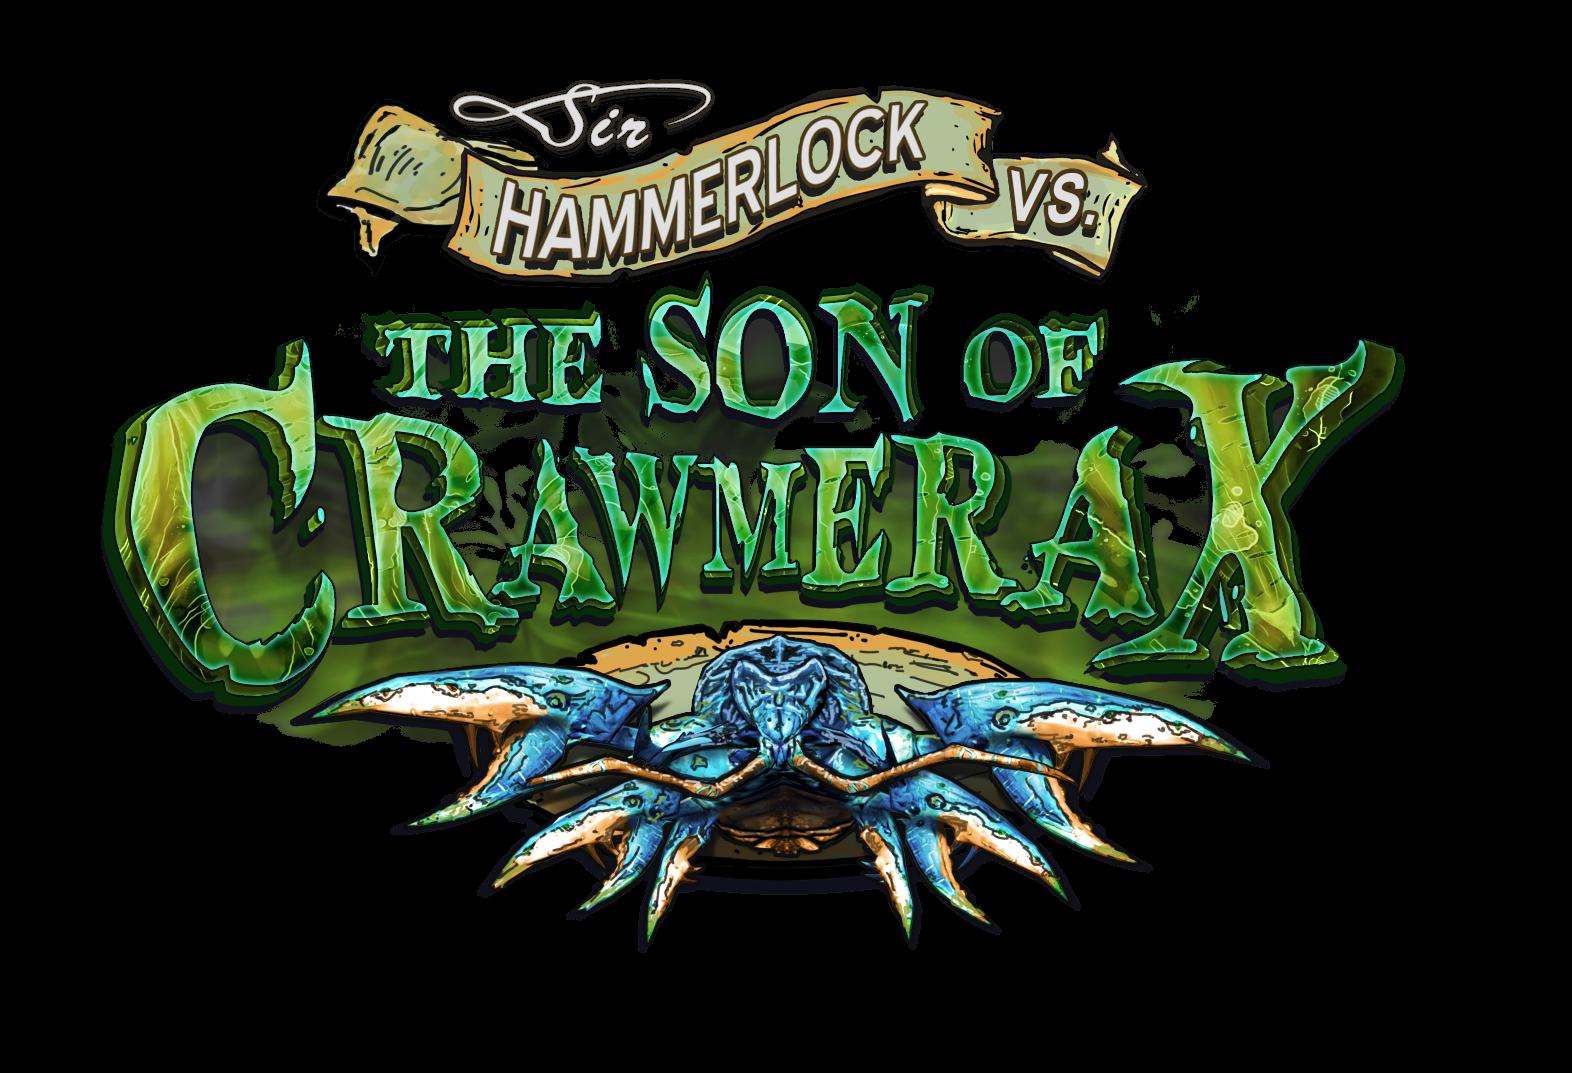 Sir Hammerlock vs